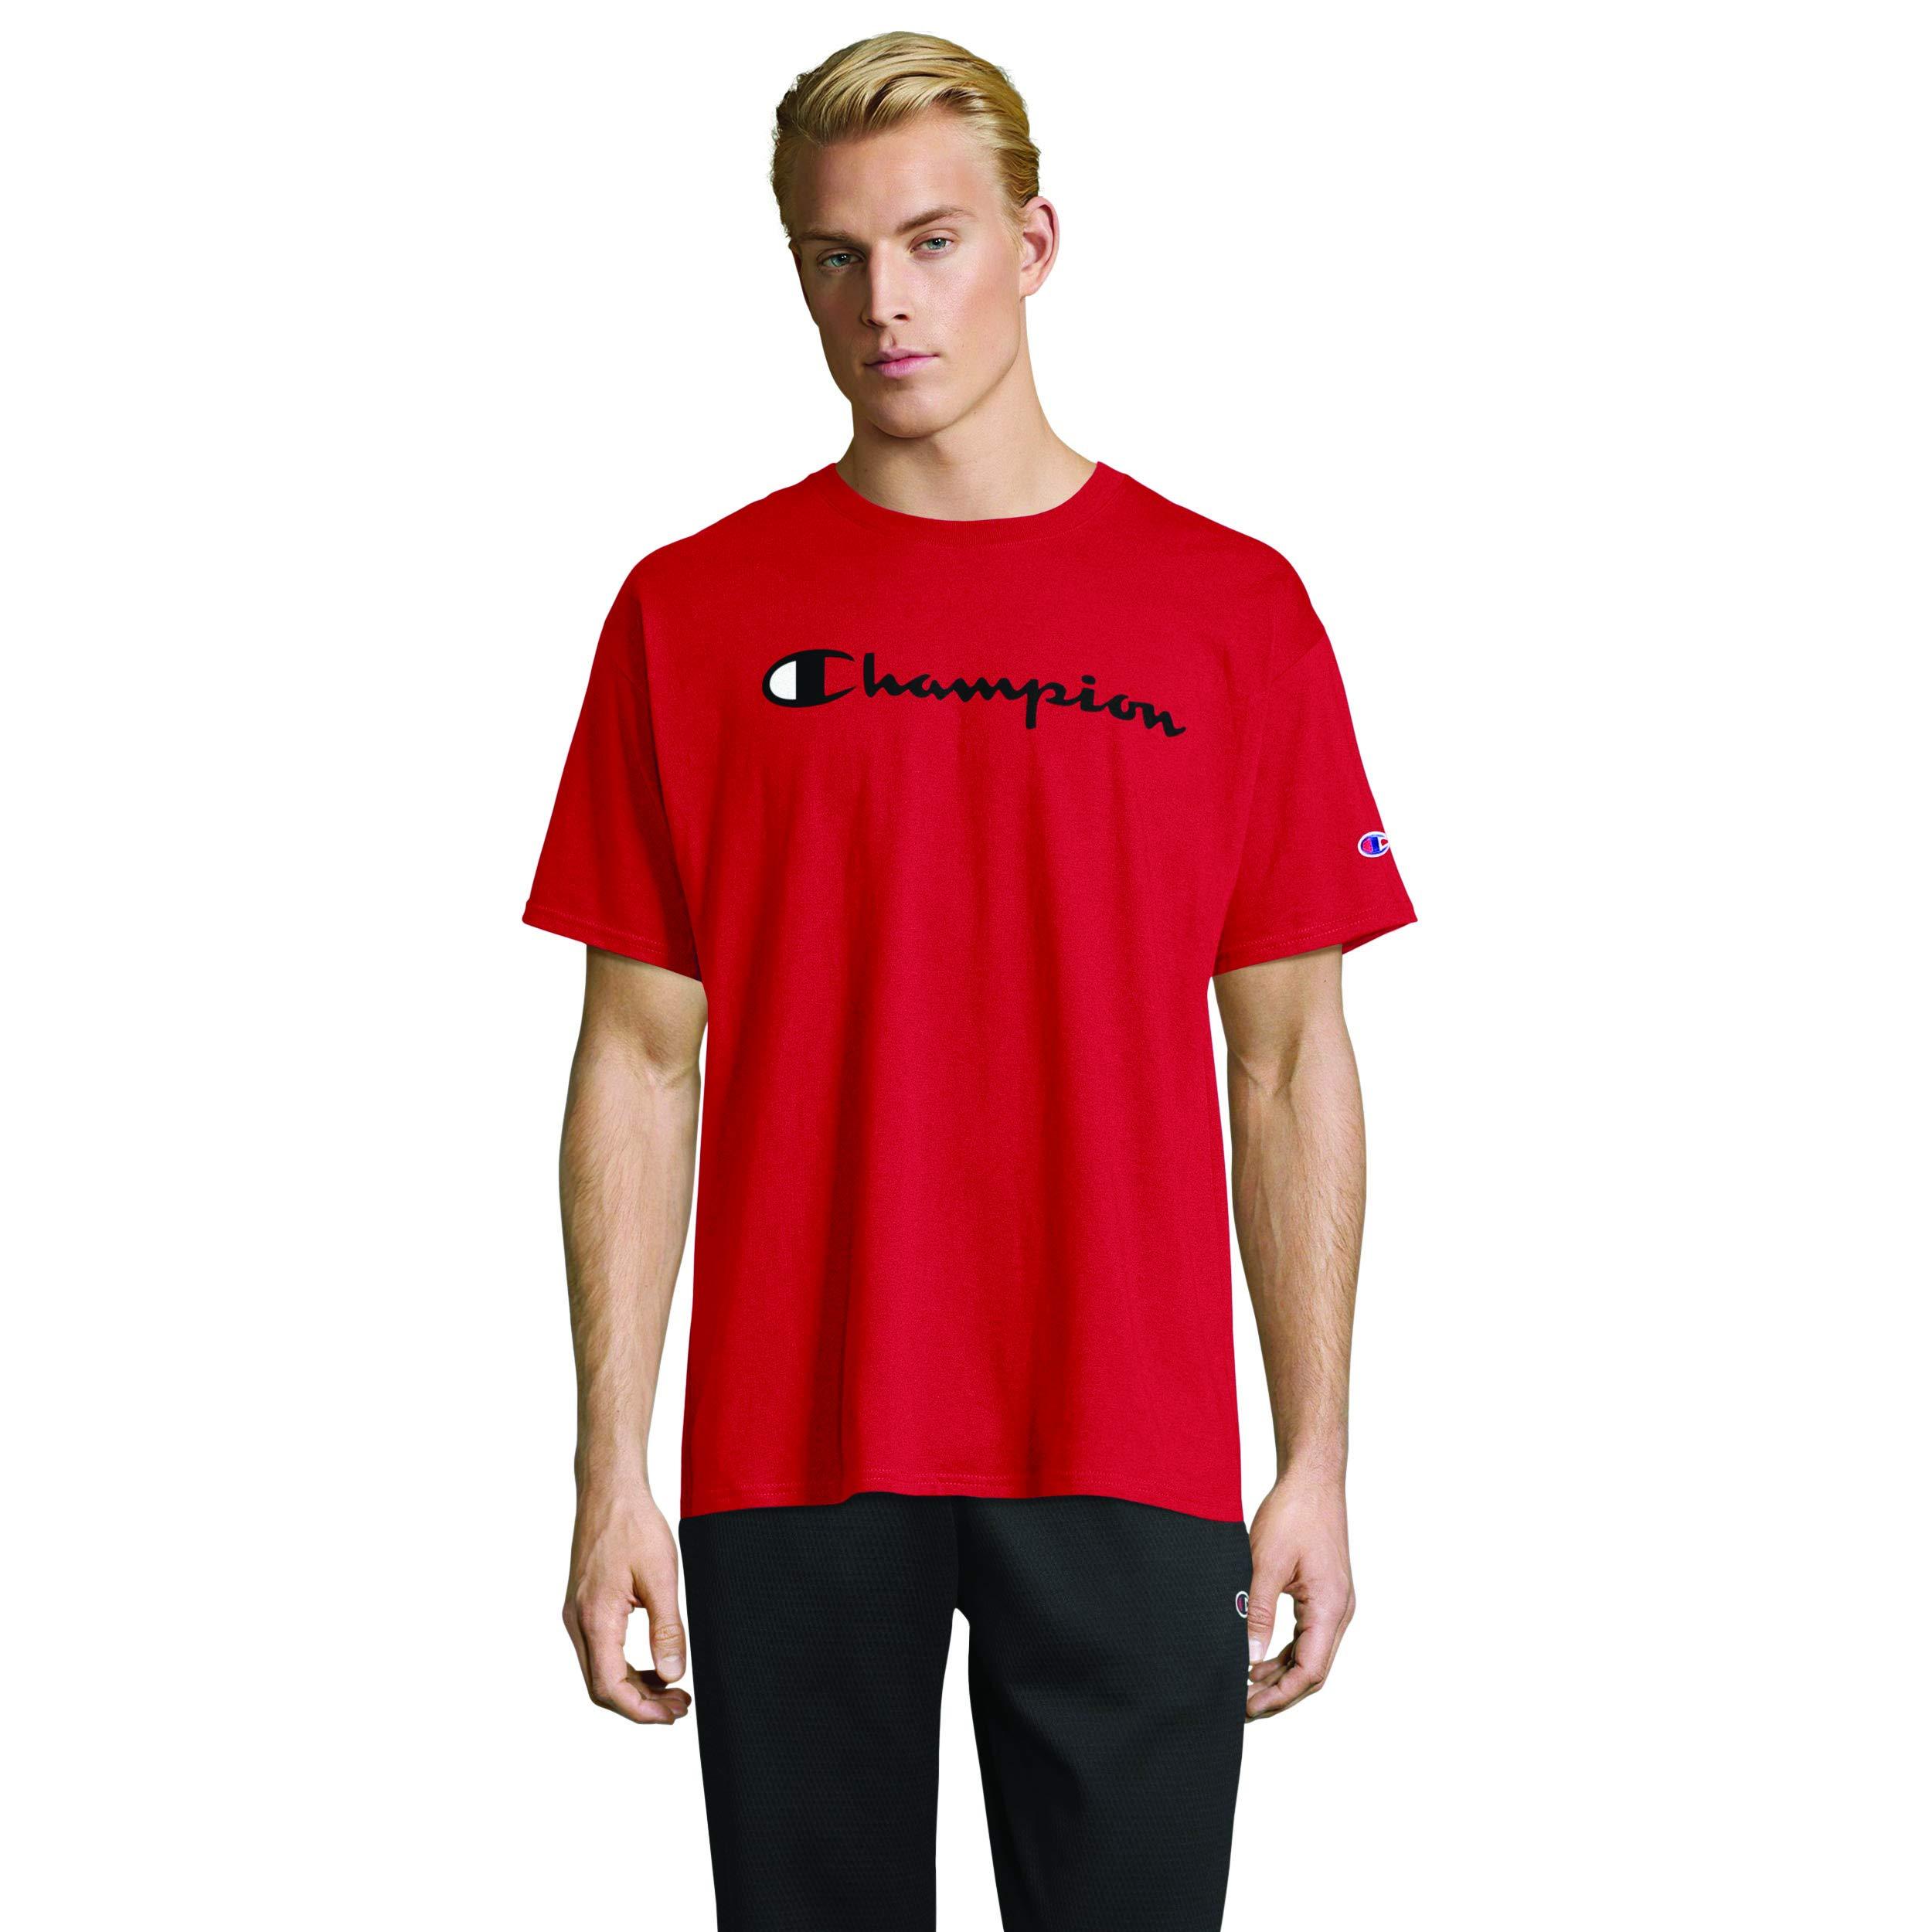 Champion Men's Classic Jersey Script T-Shirt, Scarlet, Medium